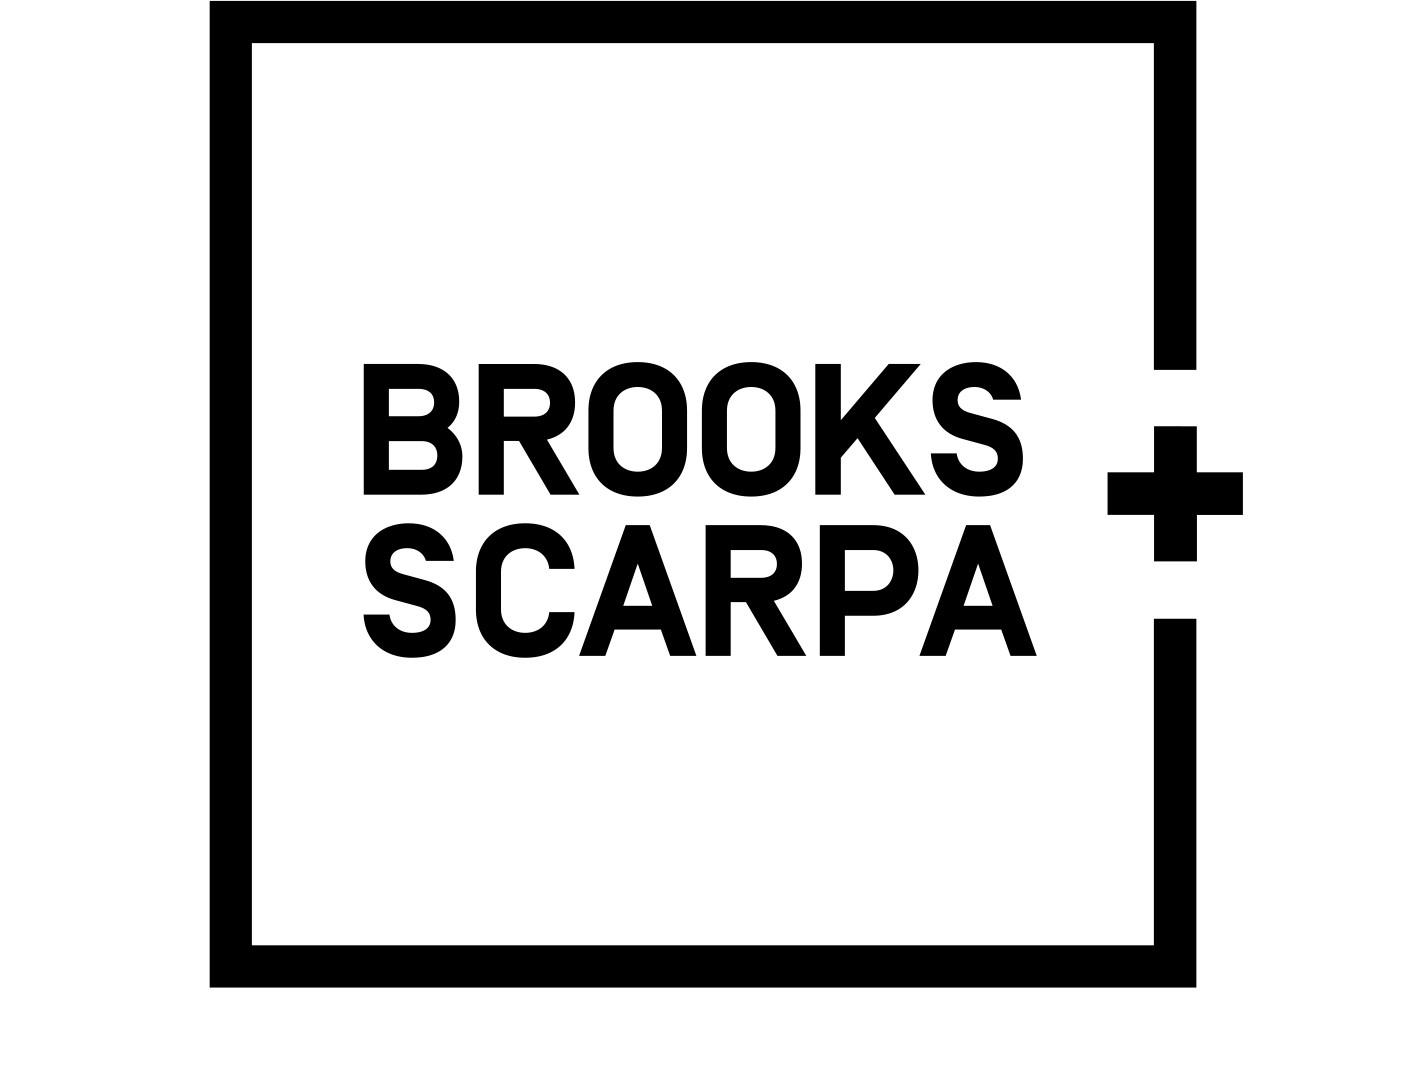 Brooks Scarpa.jpg